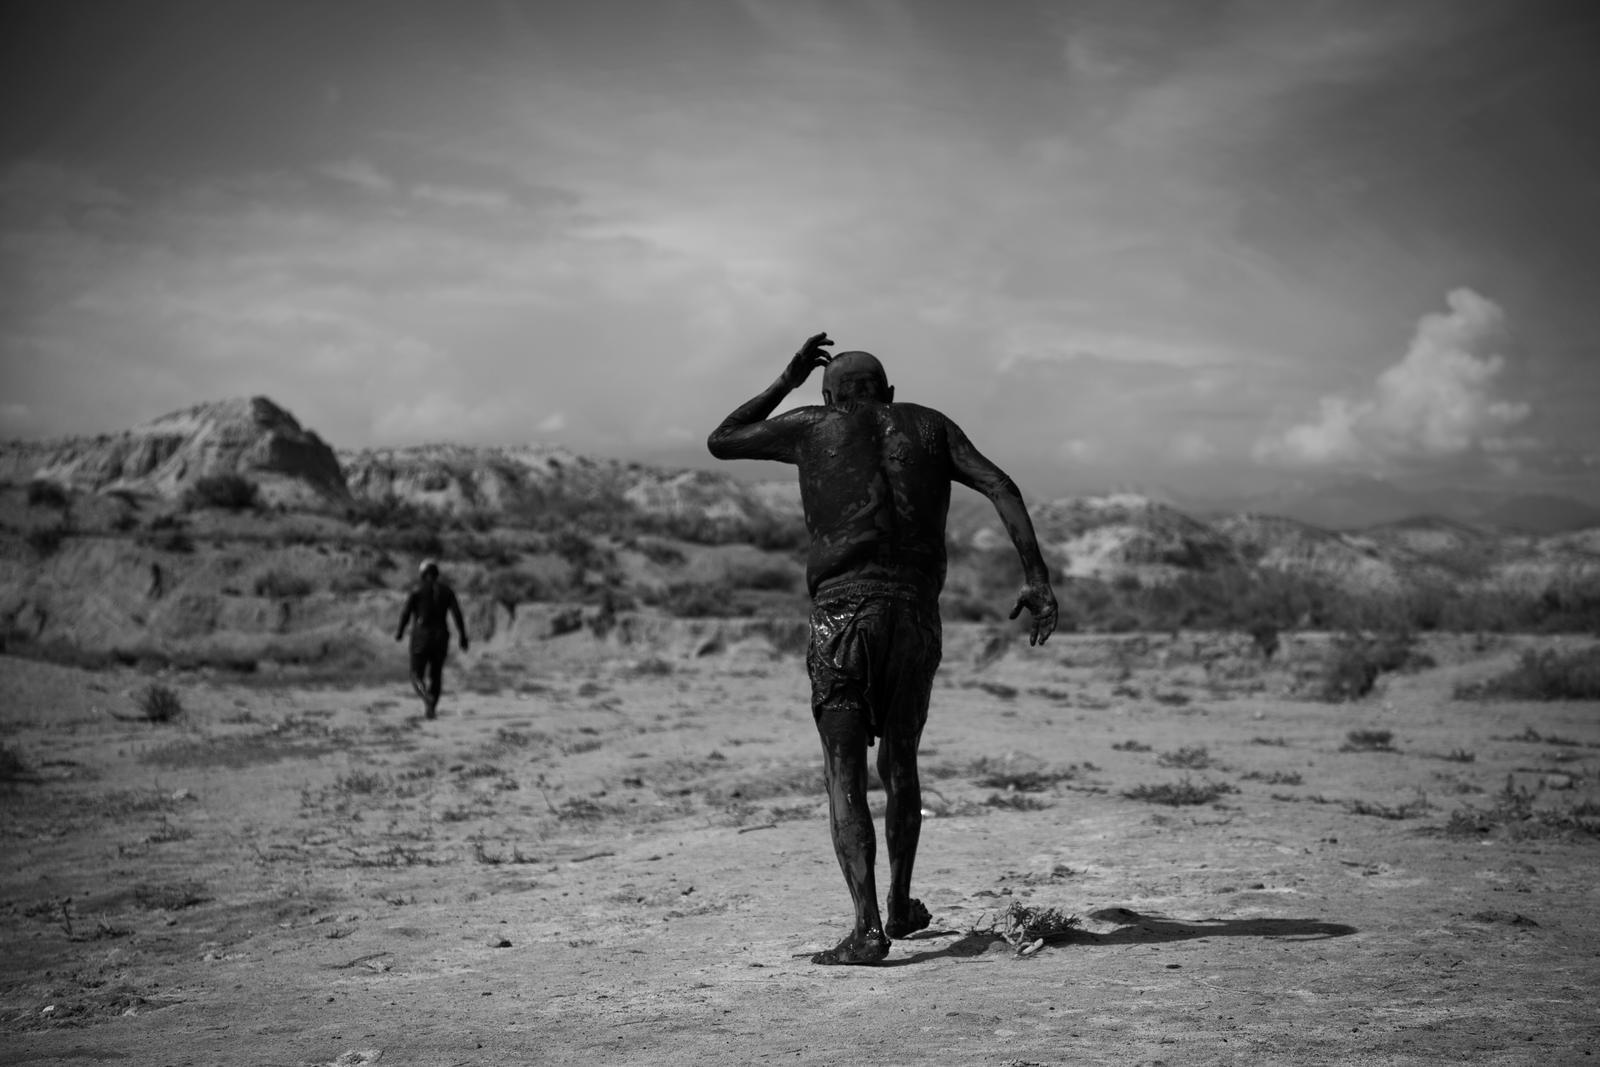 -TIMELESS- Mud Men in Kyrgyzstan Salt Lake by yavuzozer